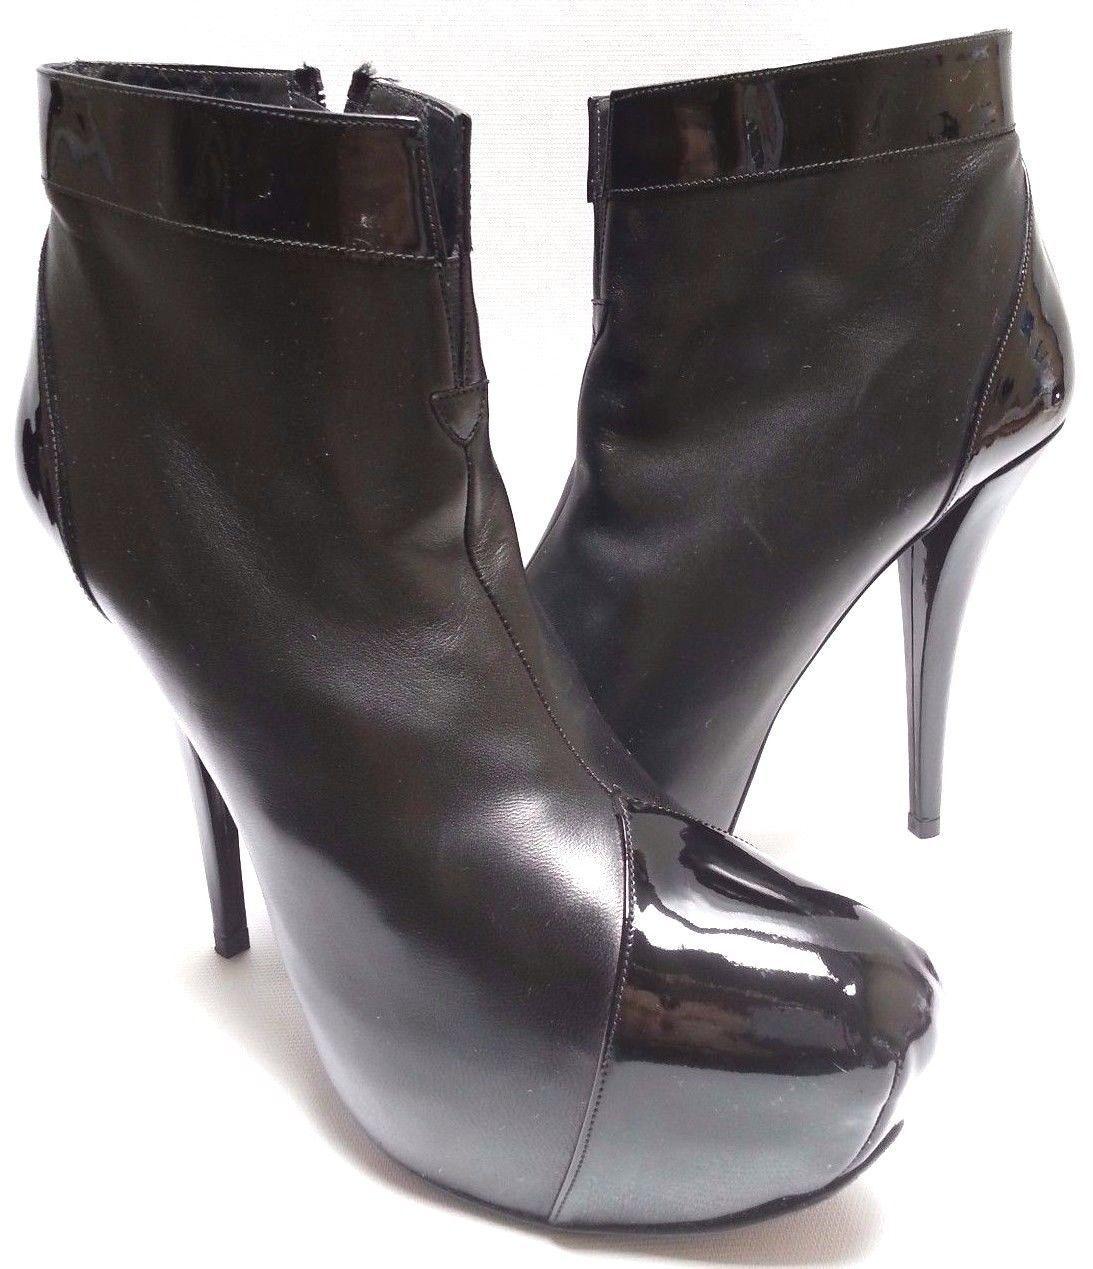 Stuart Weitzman Agree Black Patent Boots Size: US10 Narrow (AA, N) RET 595.00